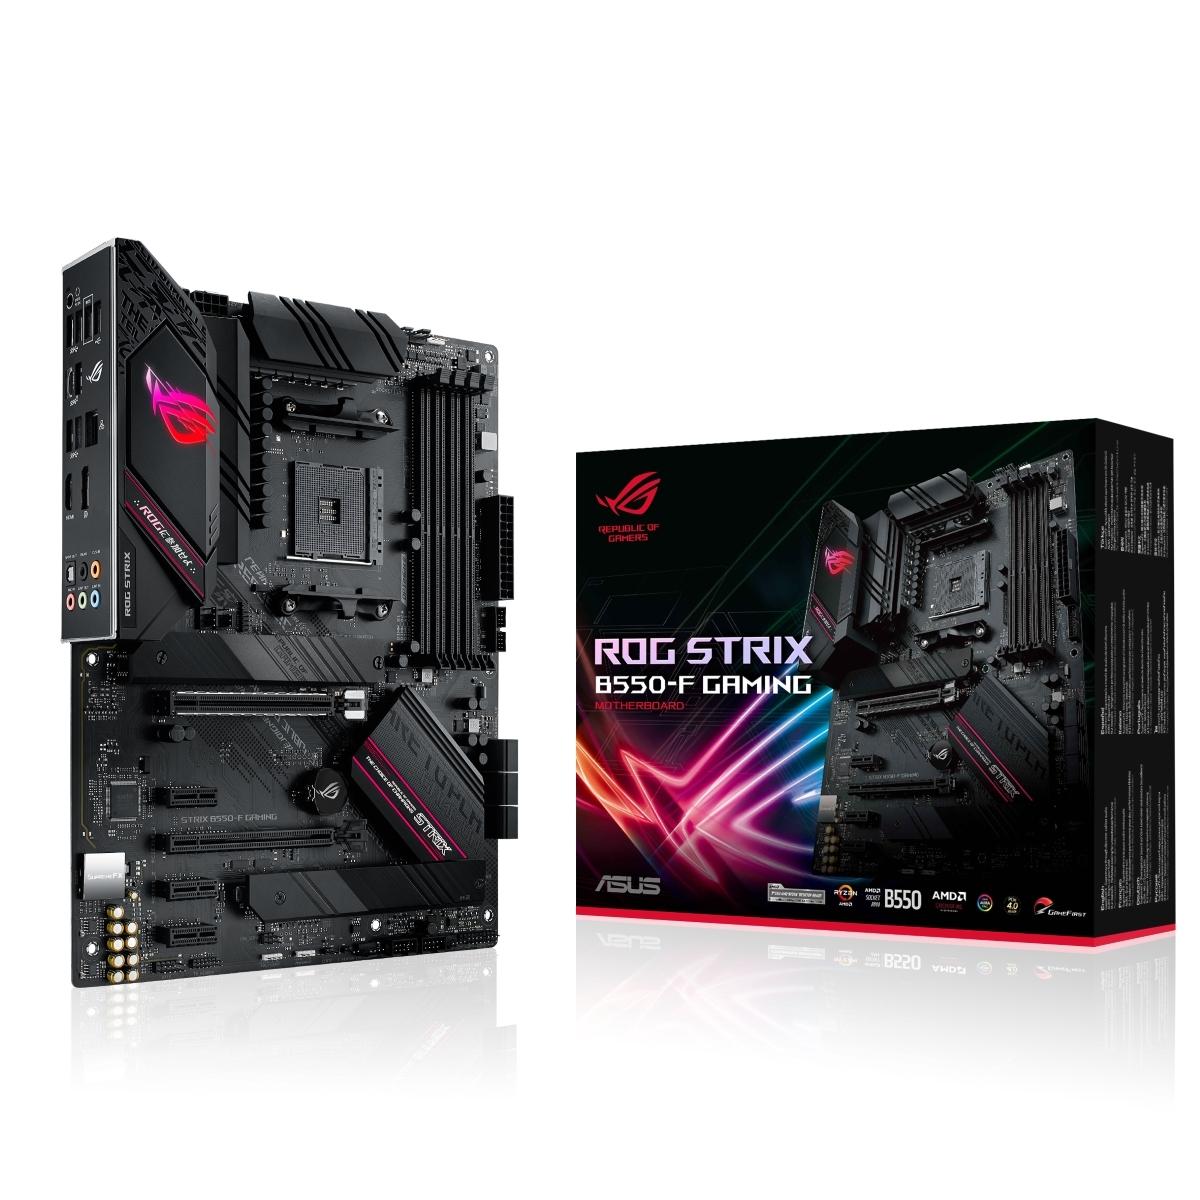 Asus ROG STRIX B550F Gaming für 179€ bei [abzgl. 25€ Cashback]